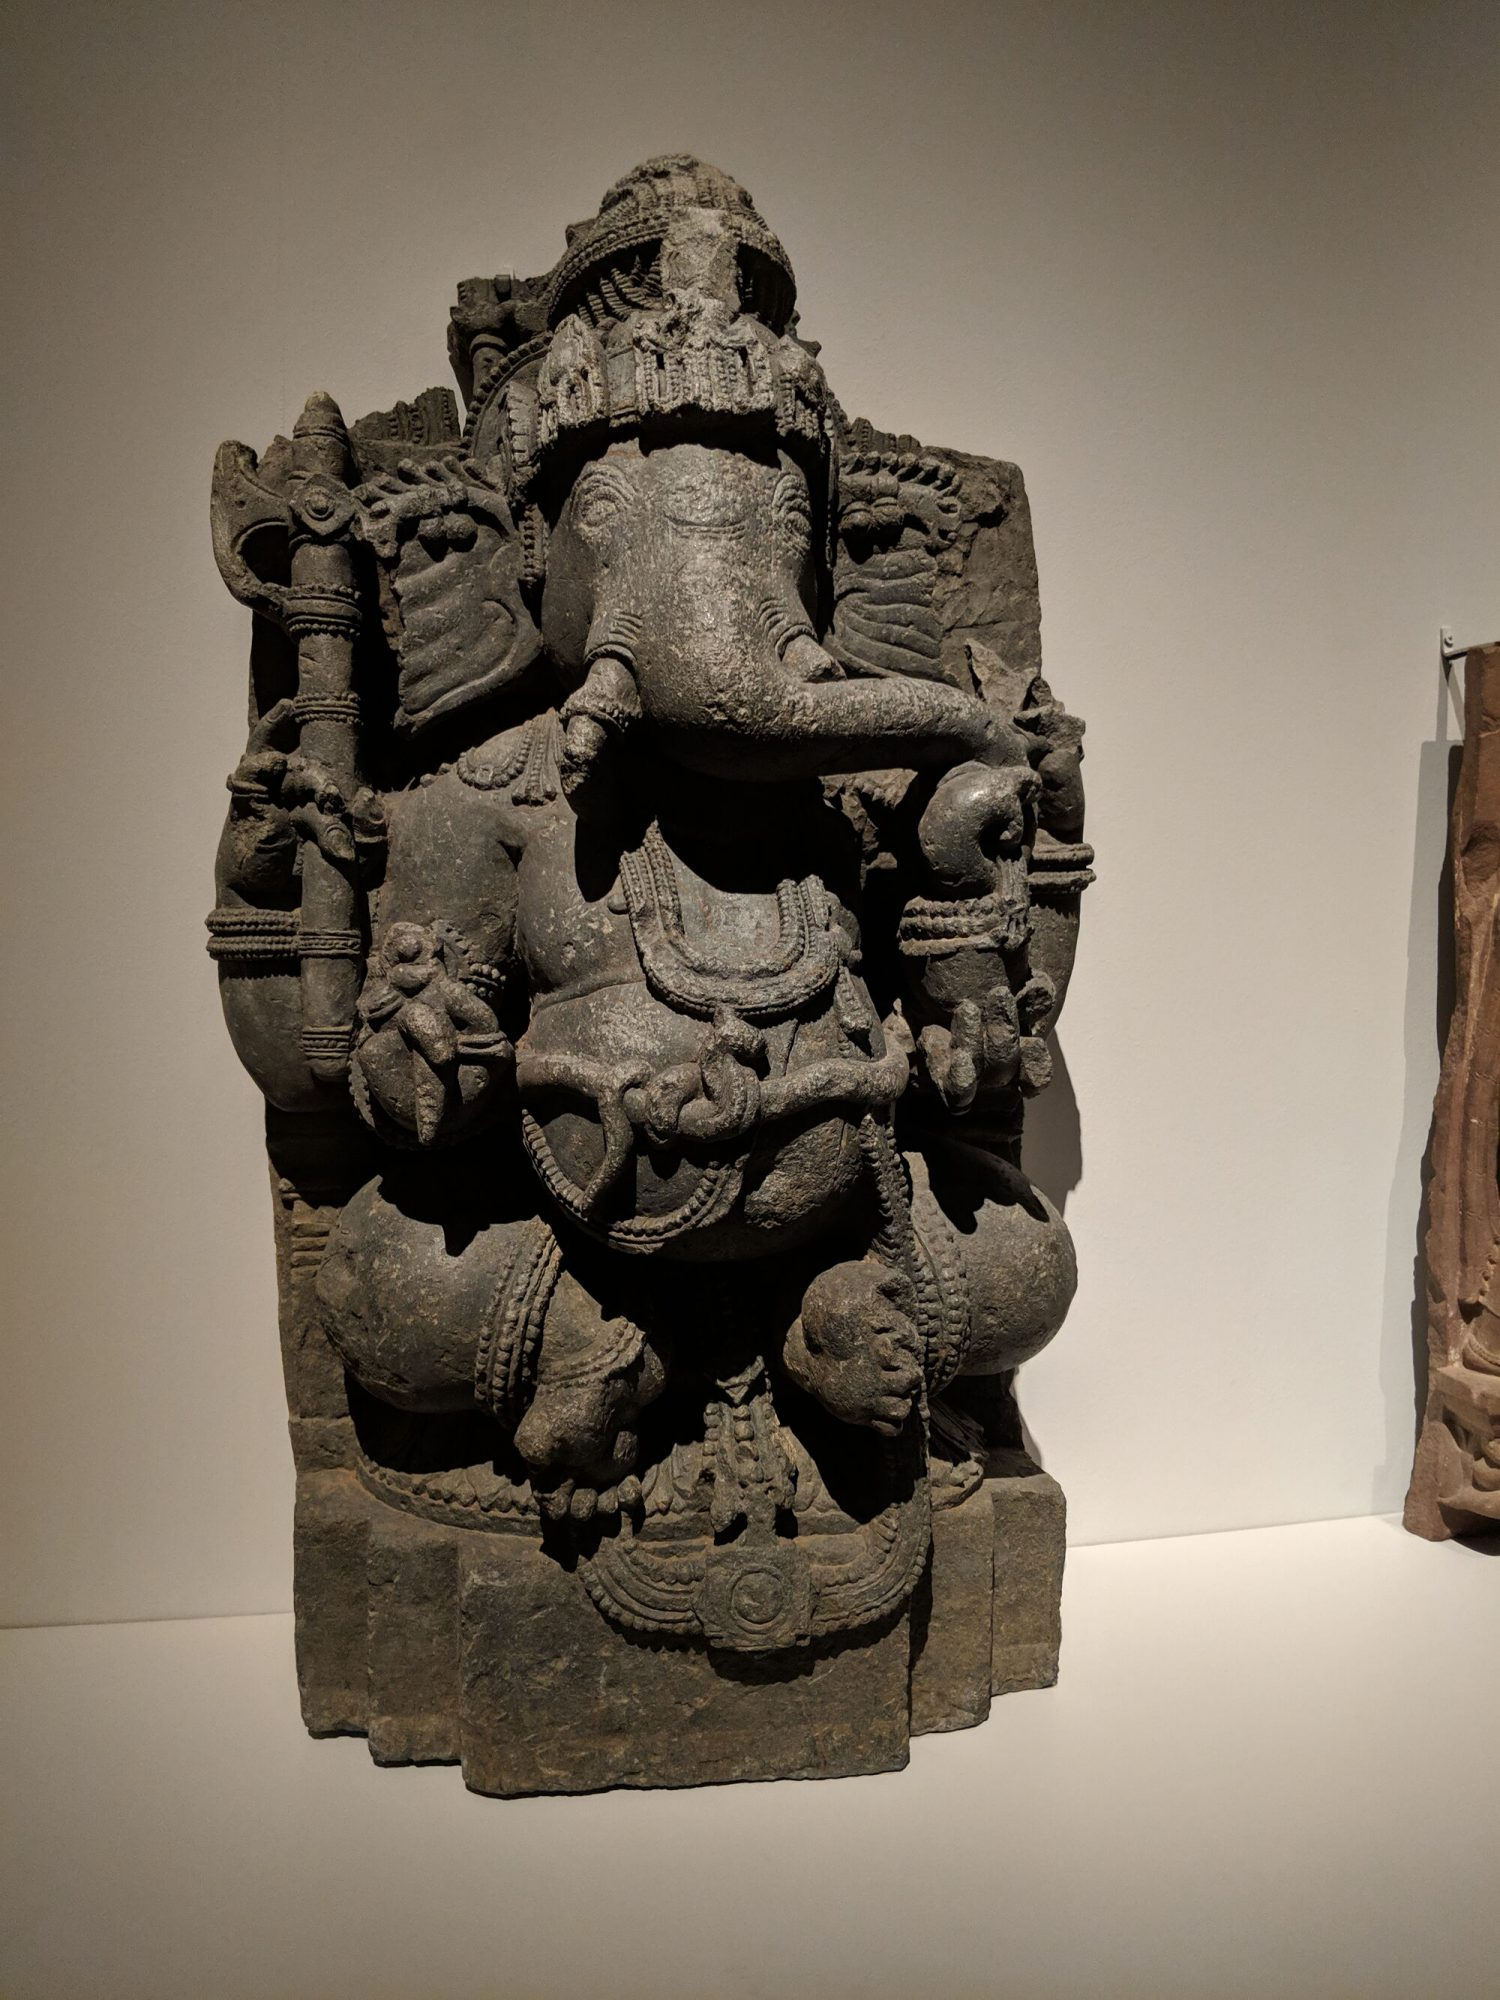 Ganesha, India, Karnataka, 12th century (Hoysala Empire). This four-armed Ganesha uses his trunk to tuck into a bowl of sweetmeats.